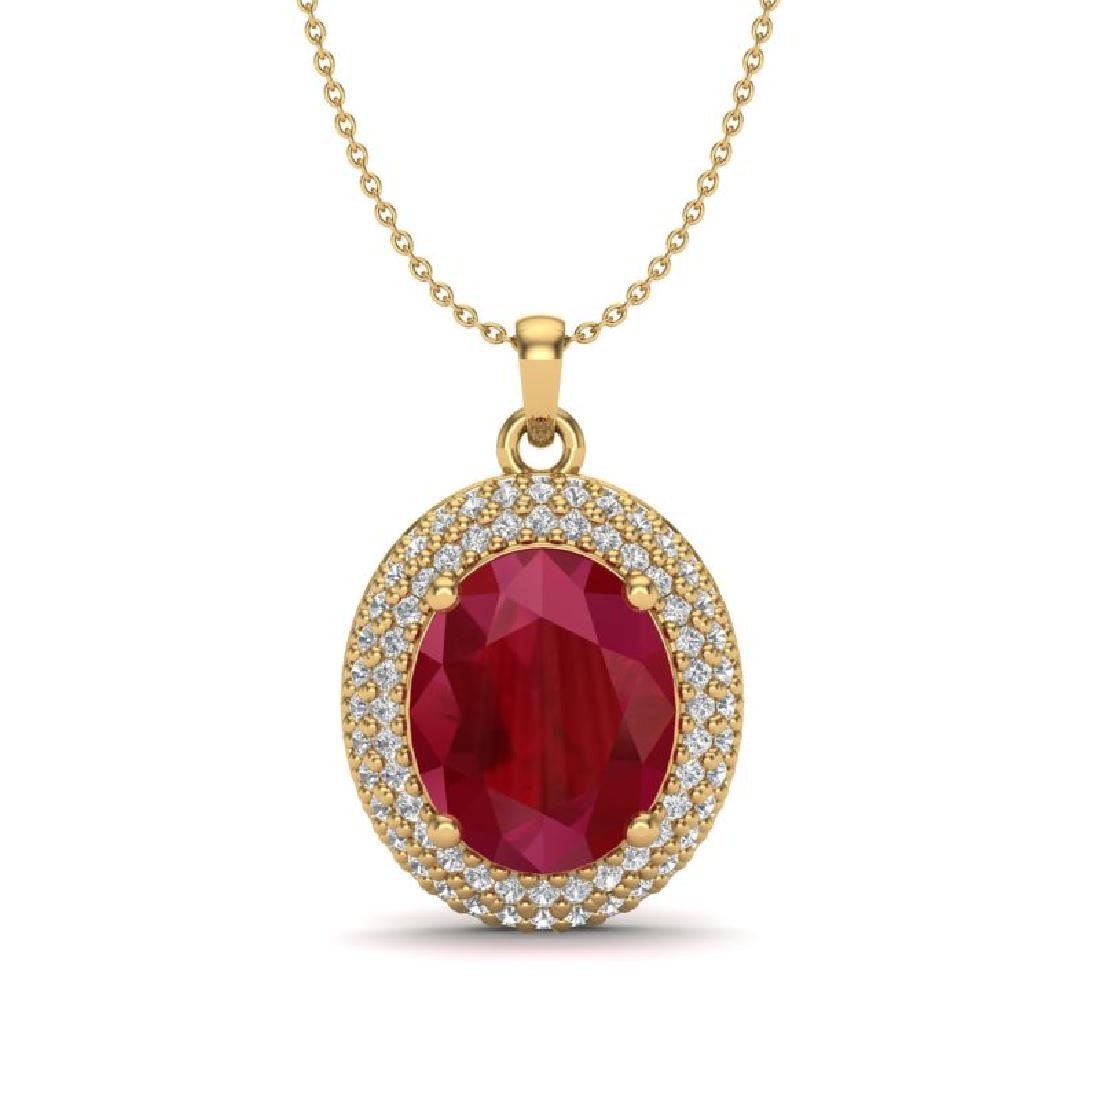 4.50 CTW Ruby & Micro Pave VS/SI Diamond Necklace 18K